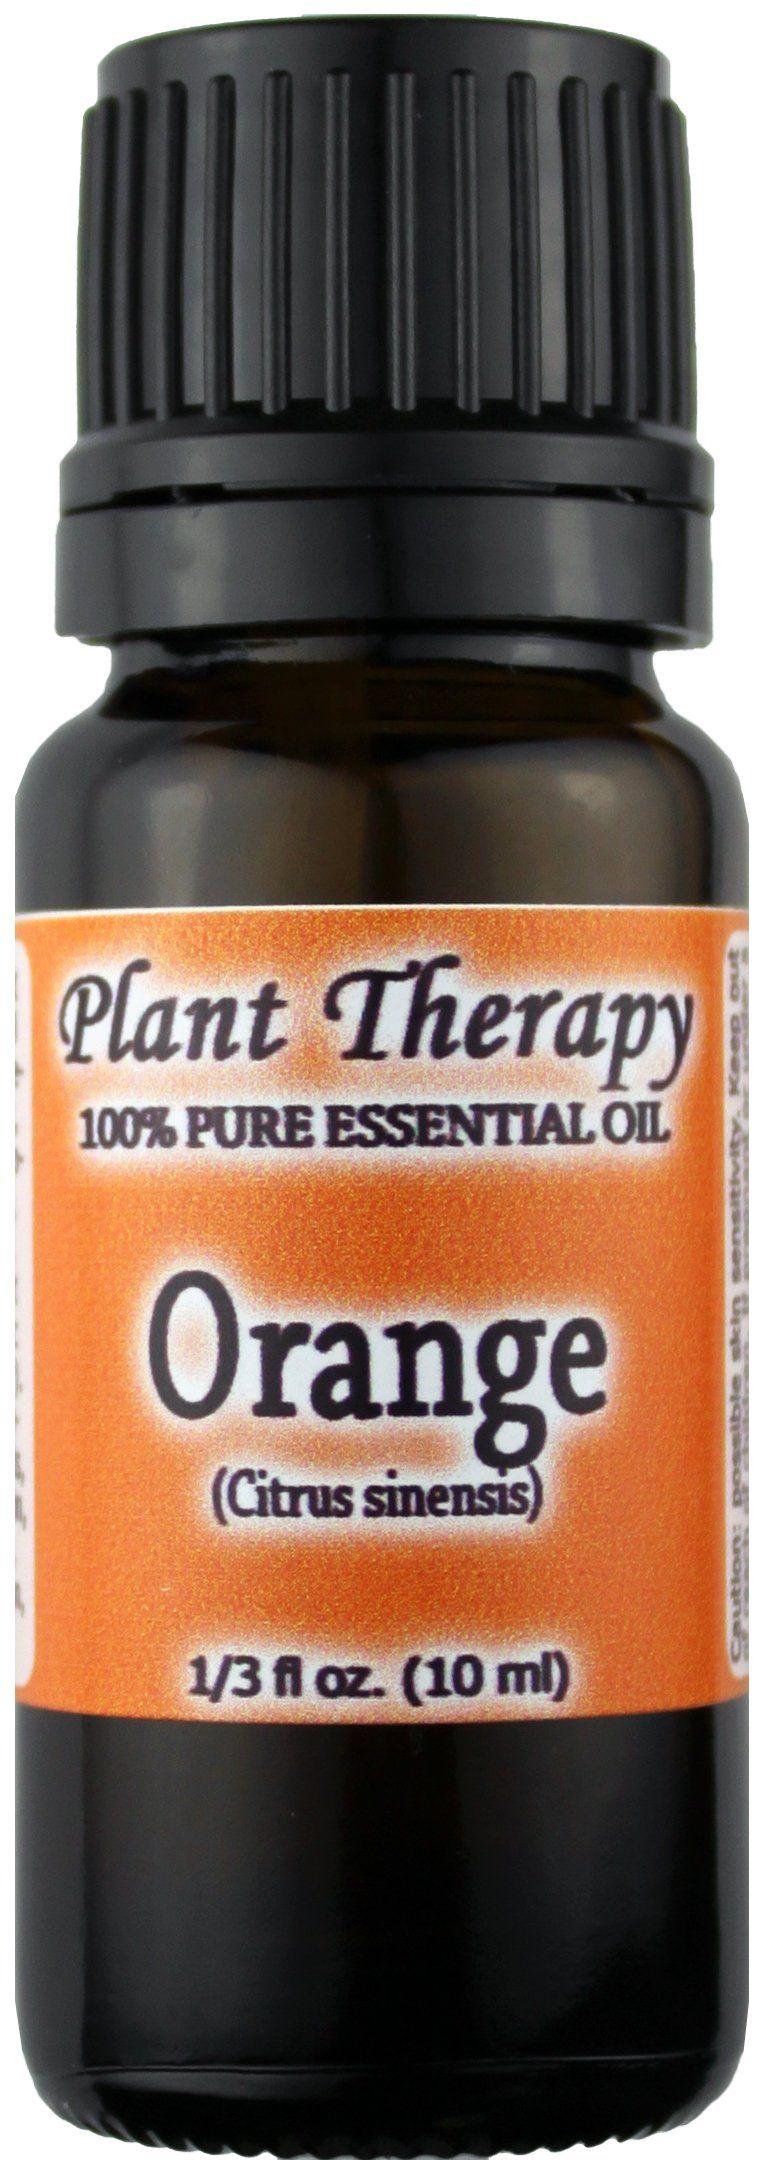 Orange Essential Oil. 10 ml. 100% Pure, Undiluted, Therapeutic Grade.